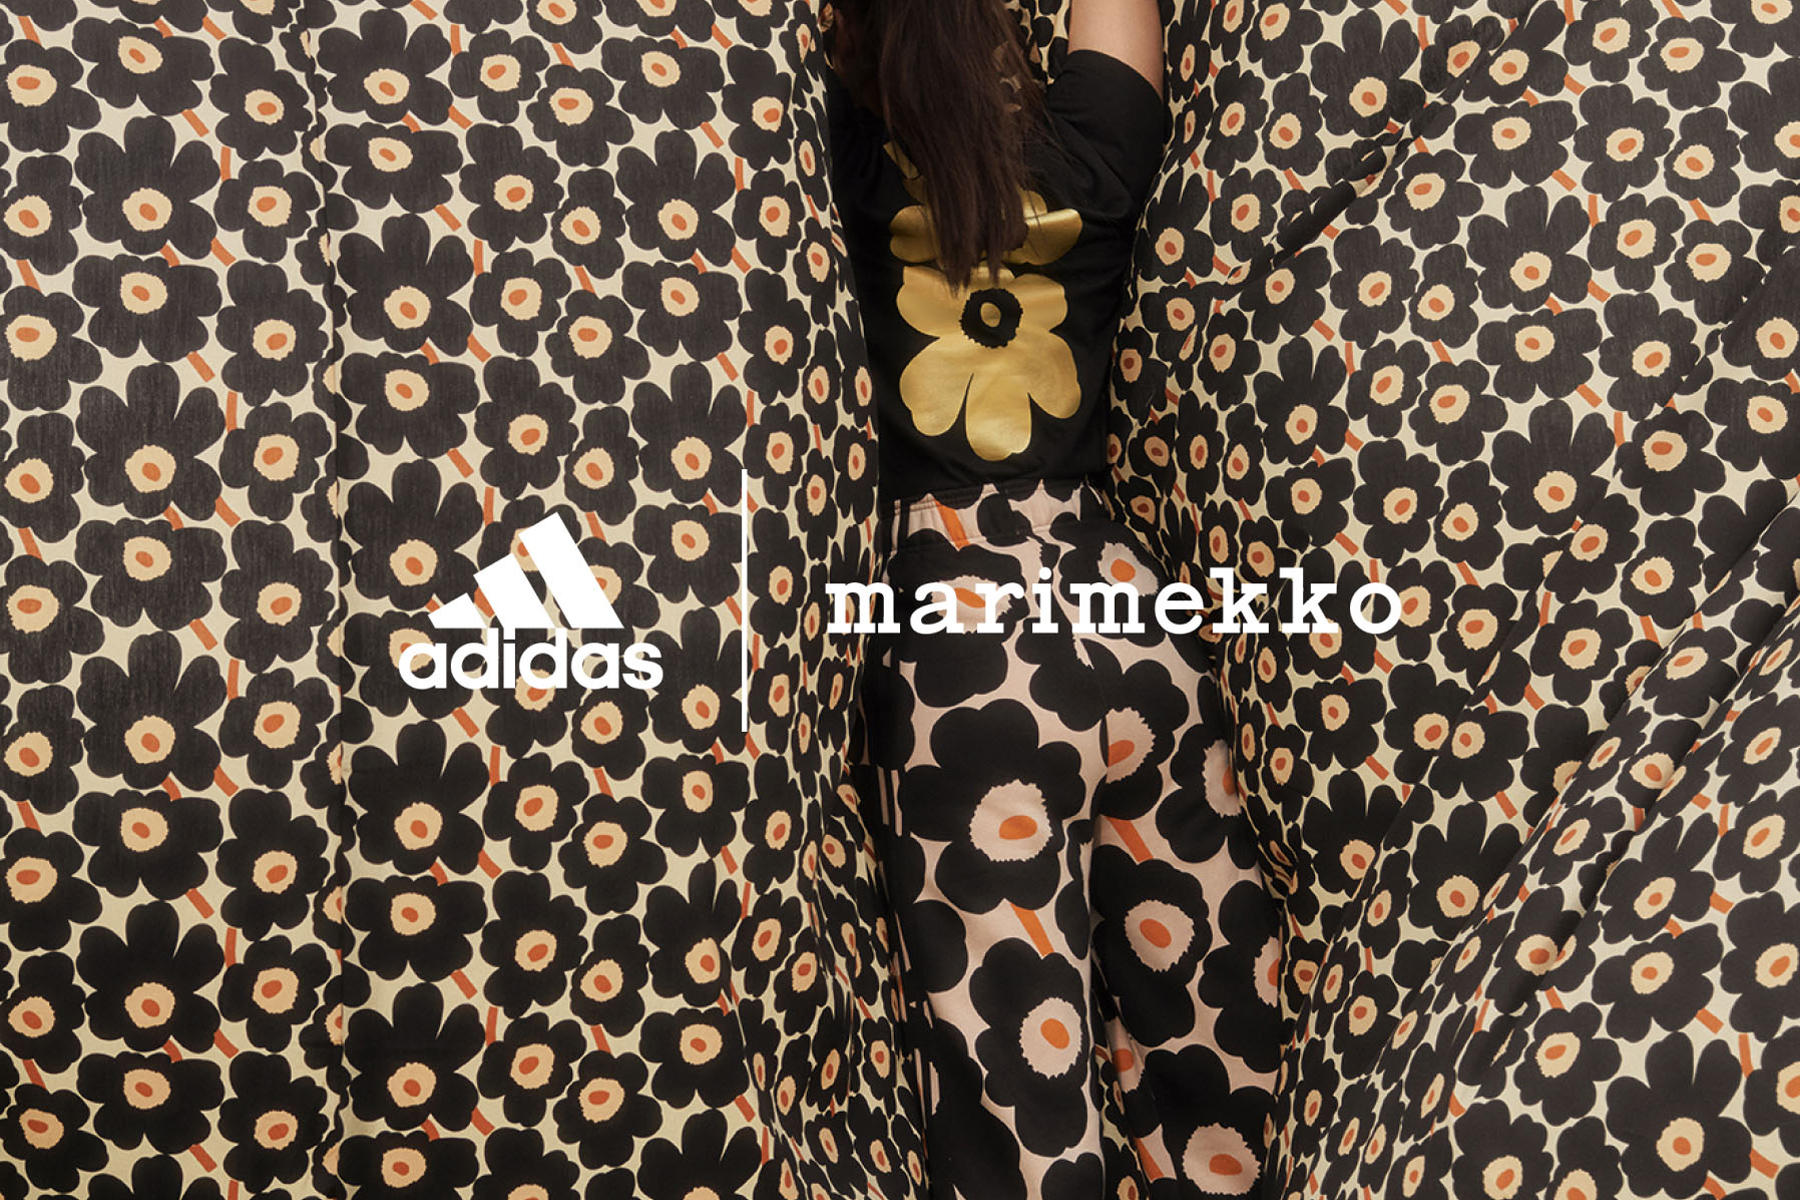 Coming soon|adidas x Marimekko - Chapter two